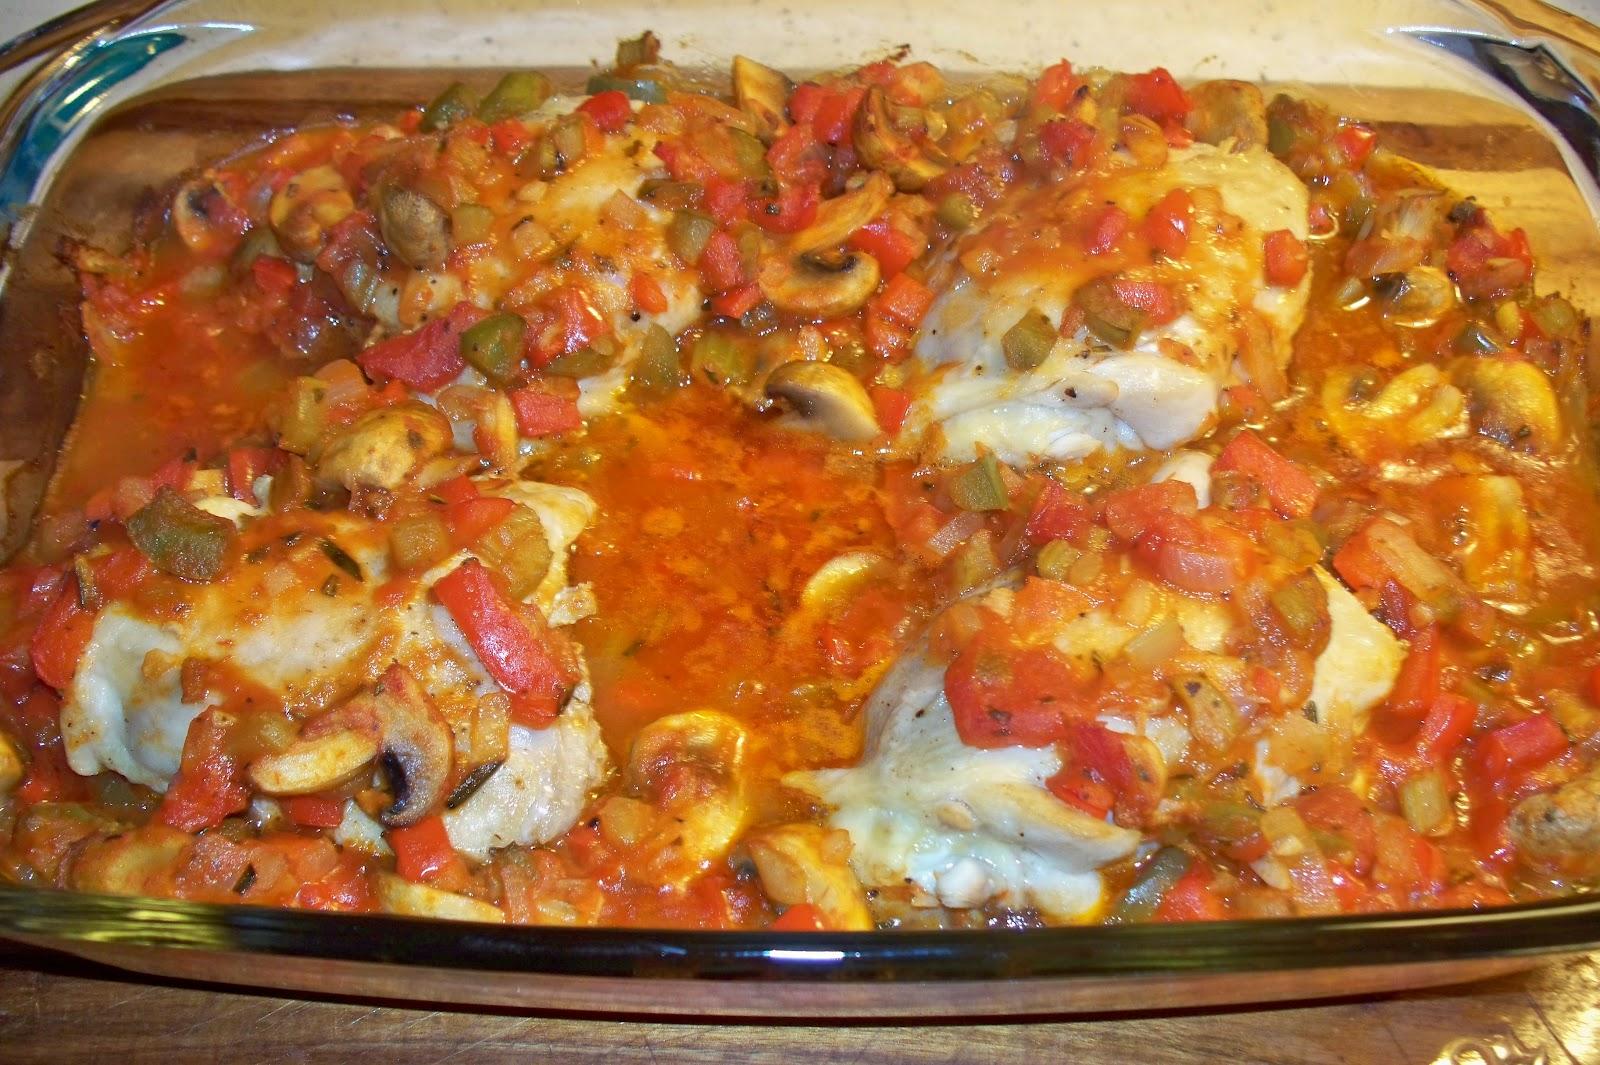 Ina Garten Recipes Chicken Cacciatore Food For Health